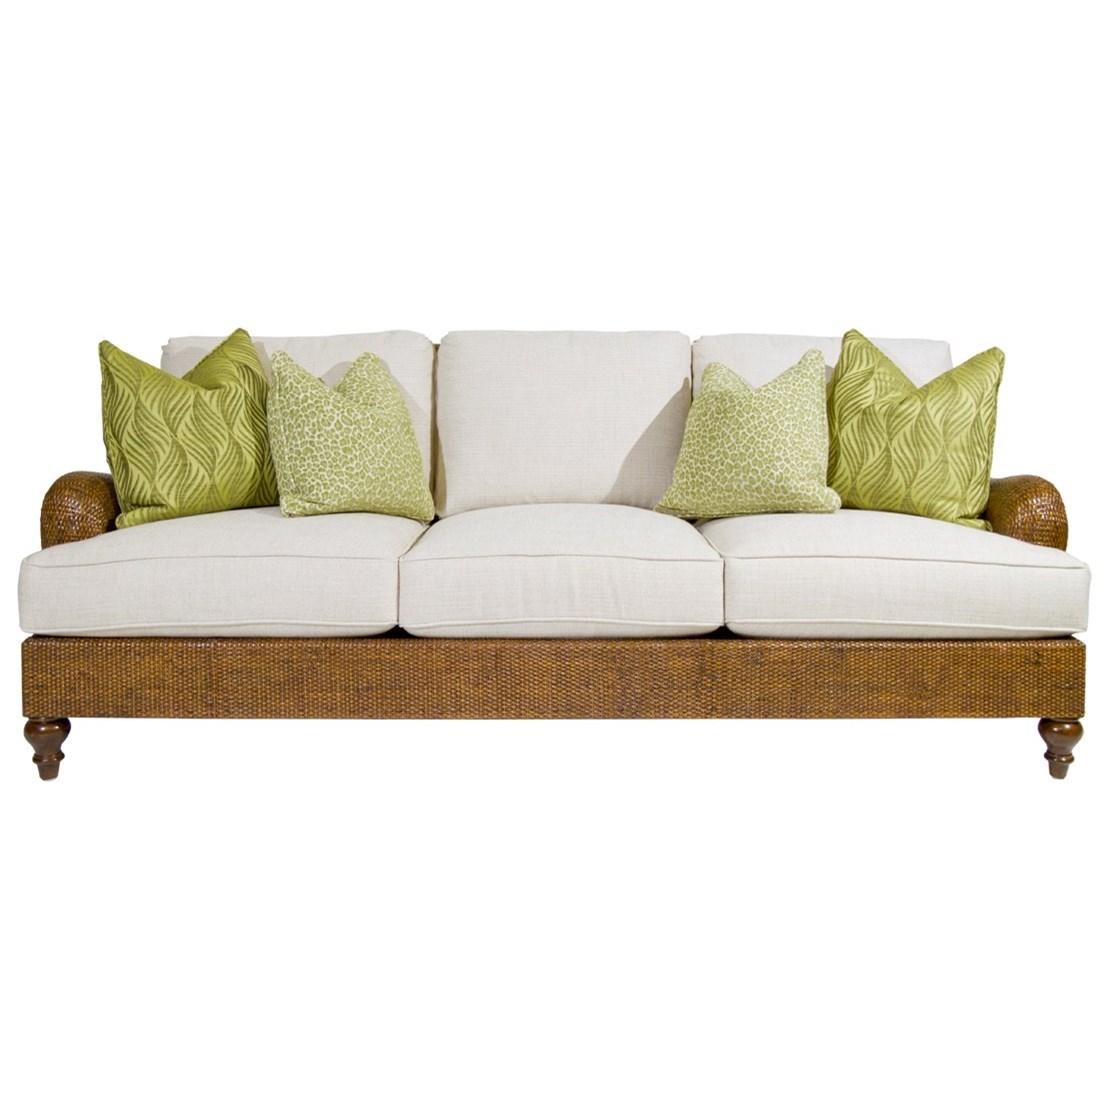 Bali Hai Harborside Sofa by Tommy Bahama Home at Baer's Furniture